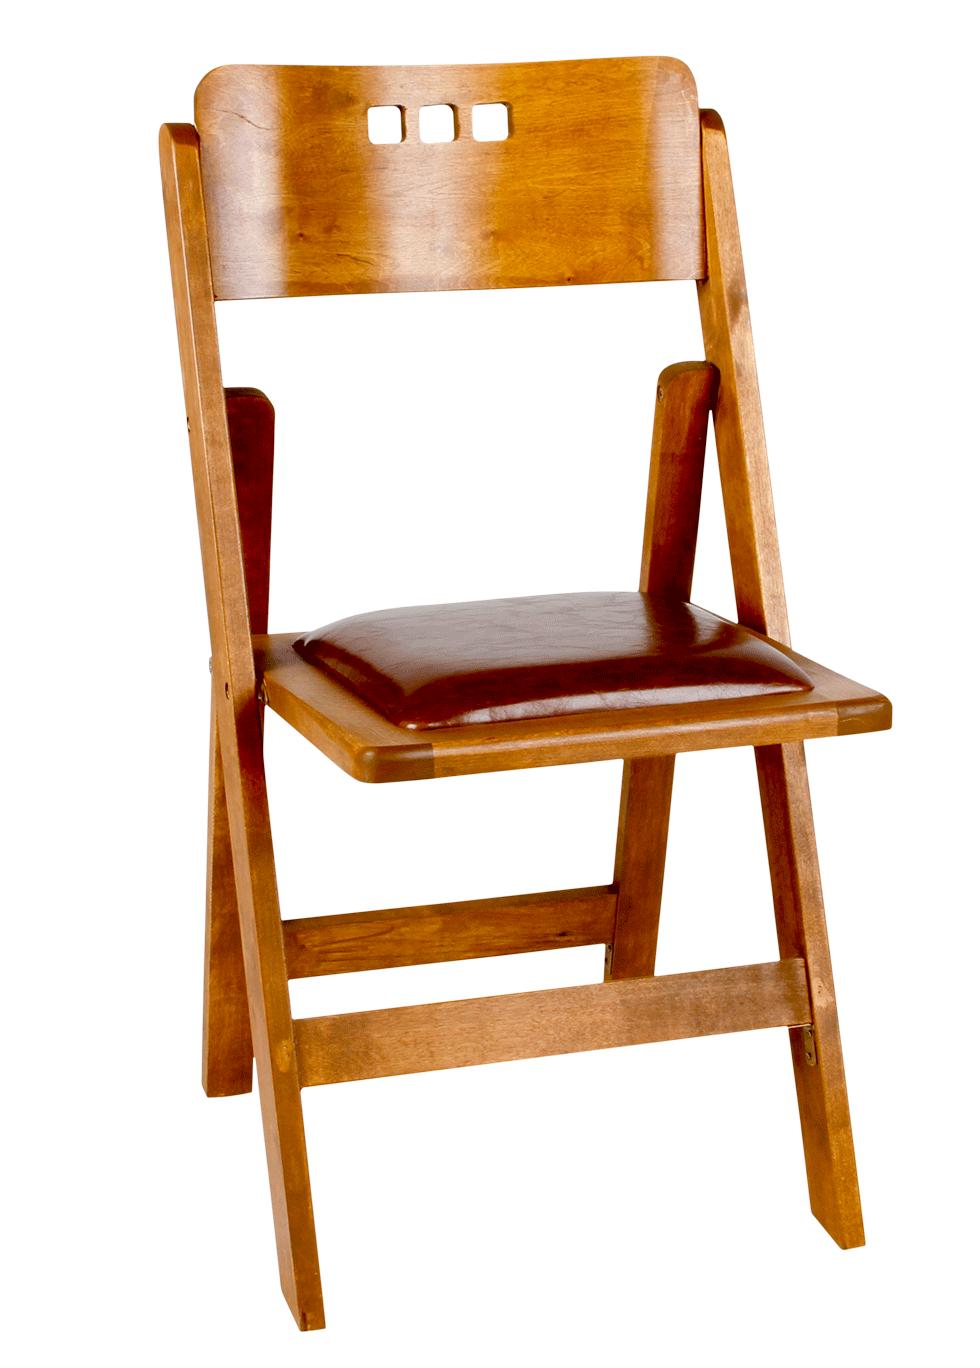 3 Hole Walnut Wood Folding Chair Rentals Bright Rentals